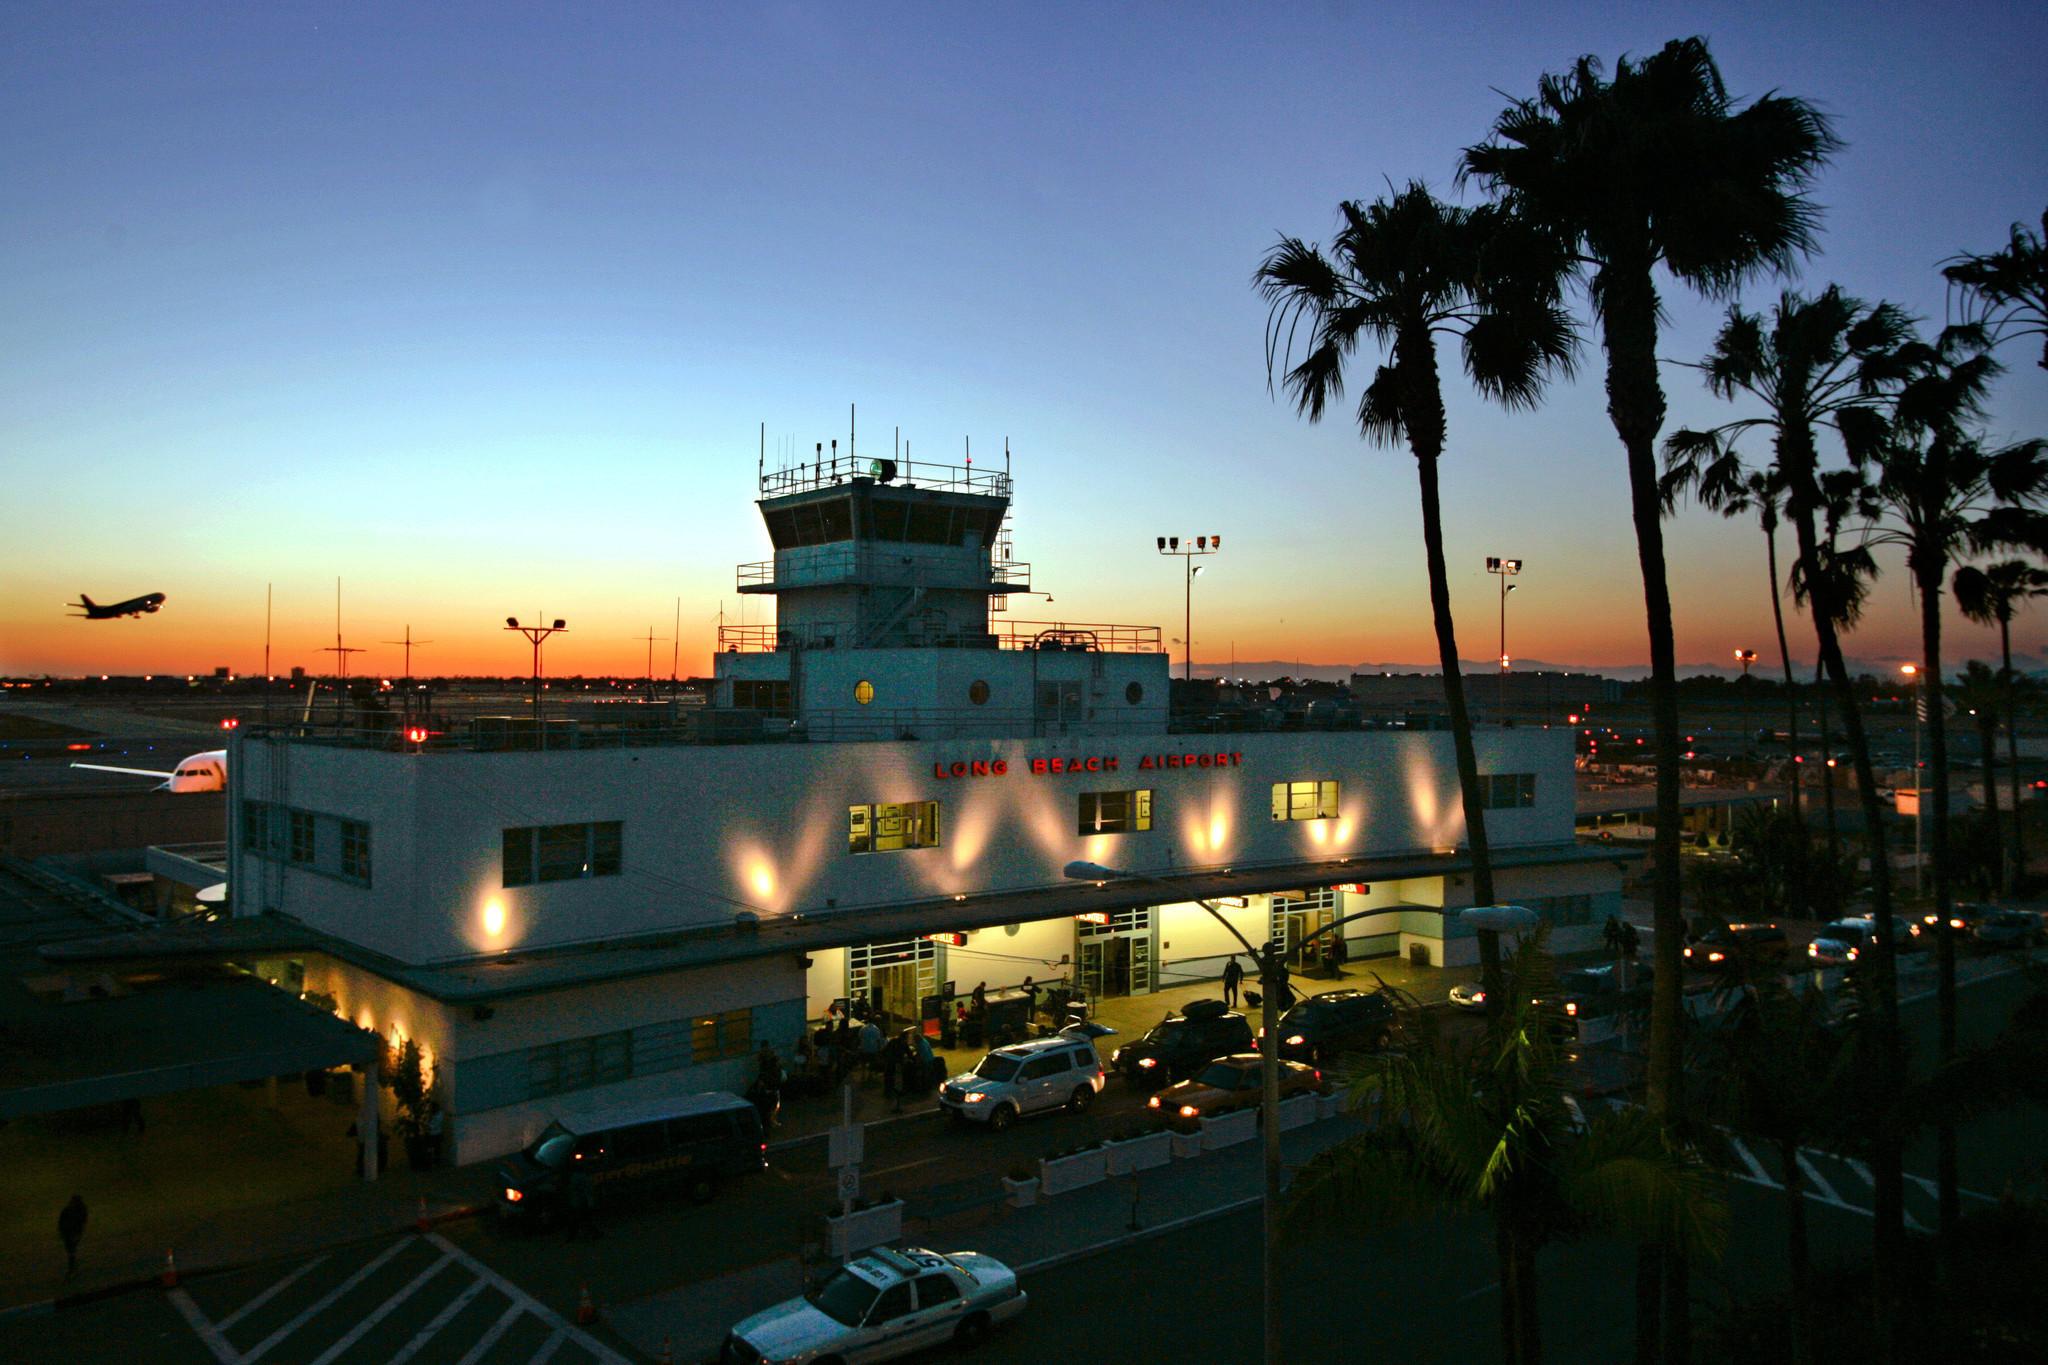 Conde Nast Traveler Survey Puts This Southern California